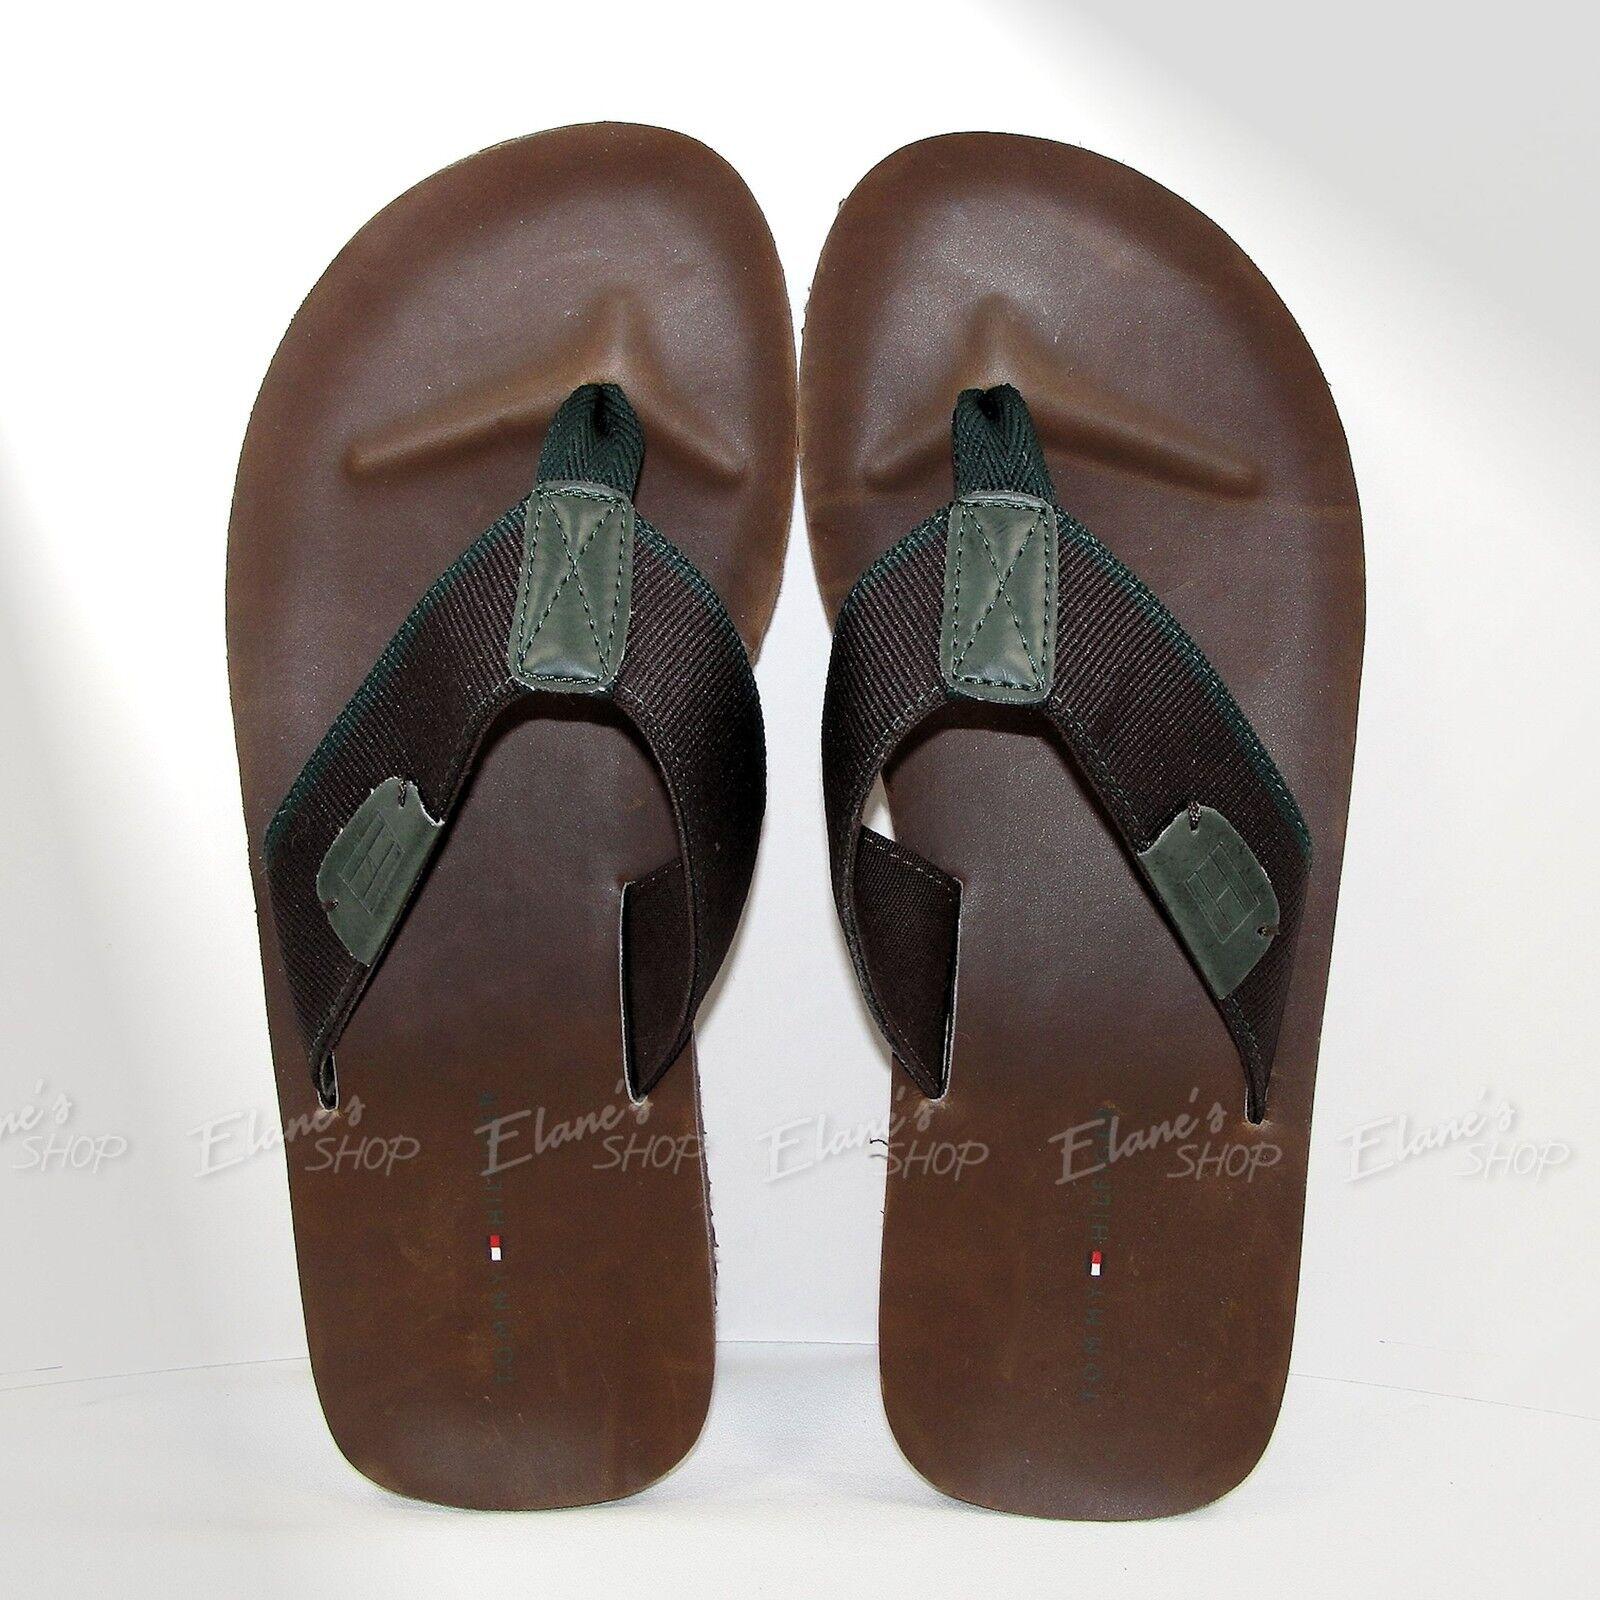 Tommy HILFIGER Flip-flops Brown DAVIS Sandals NWT Pick Size NEW Thong Men's